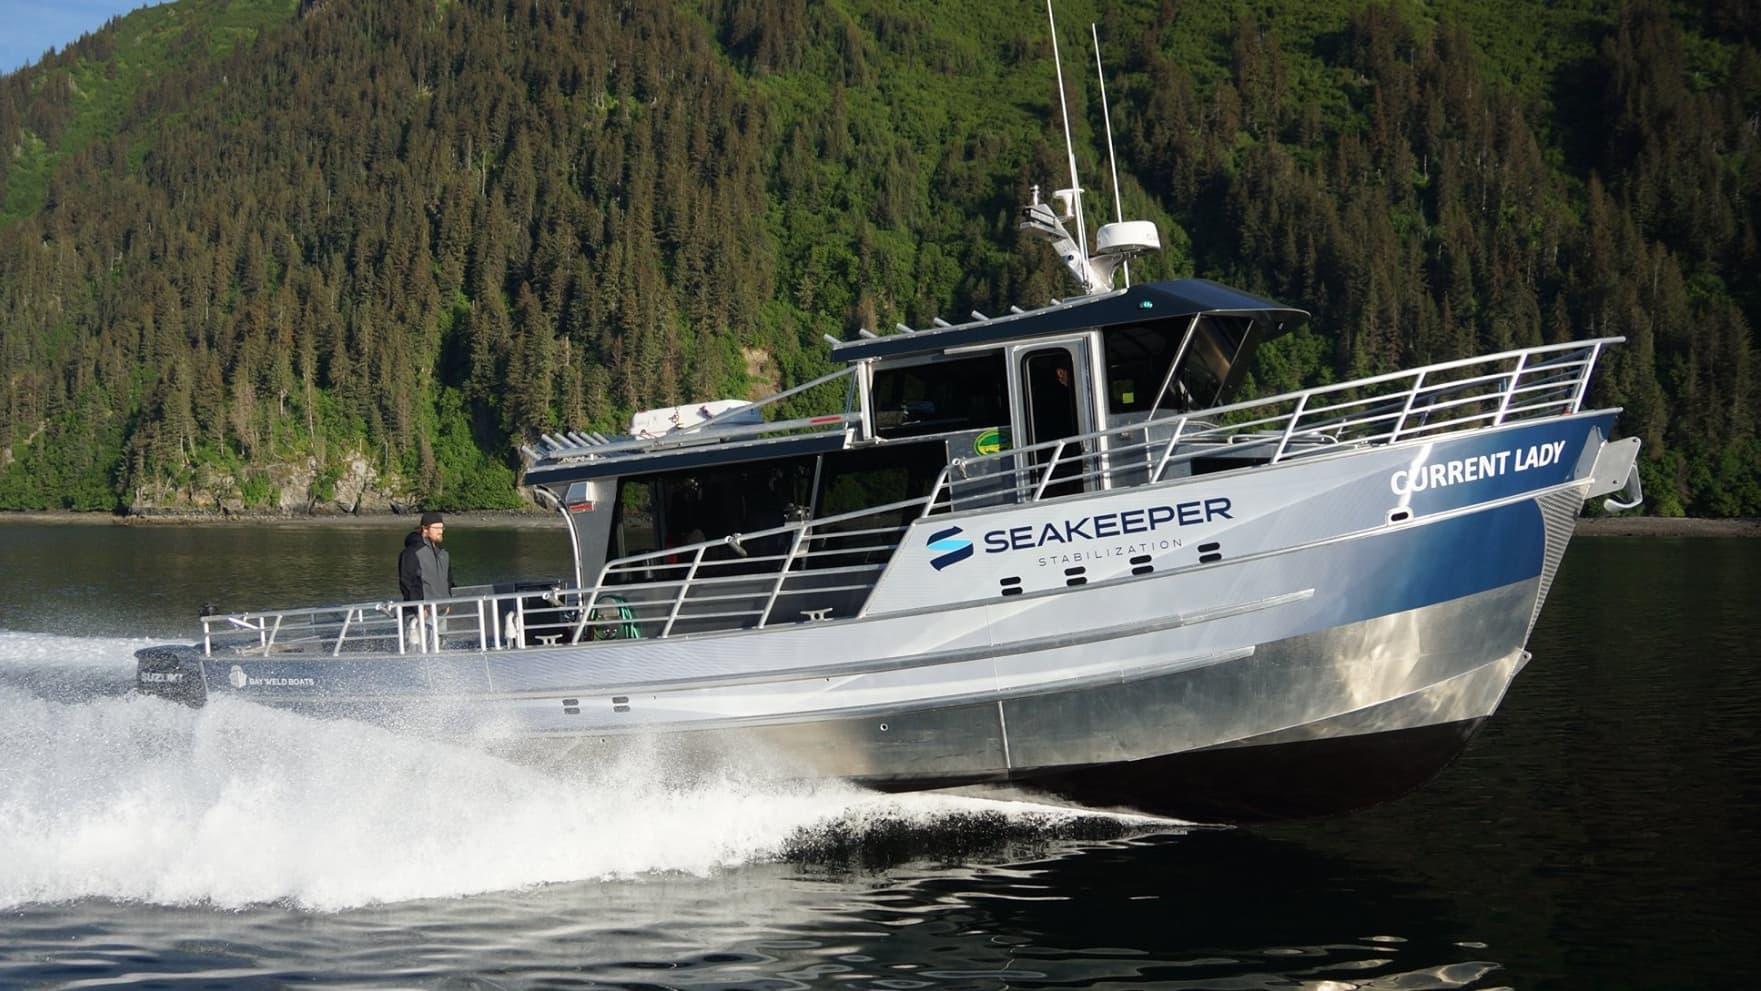 current lady charter fishing boat homer alaska deepstrike sportfishing bay weld boats seakeeper stabilization